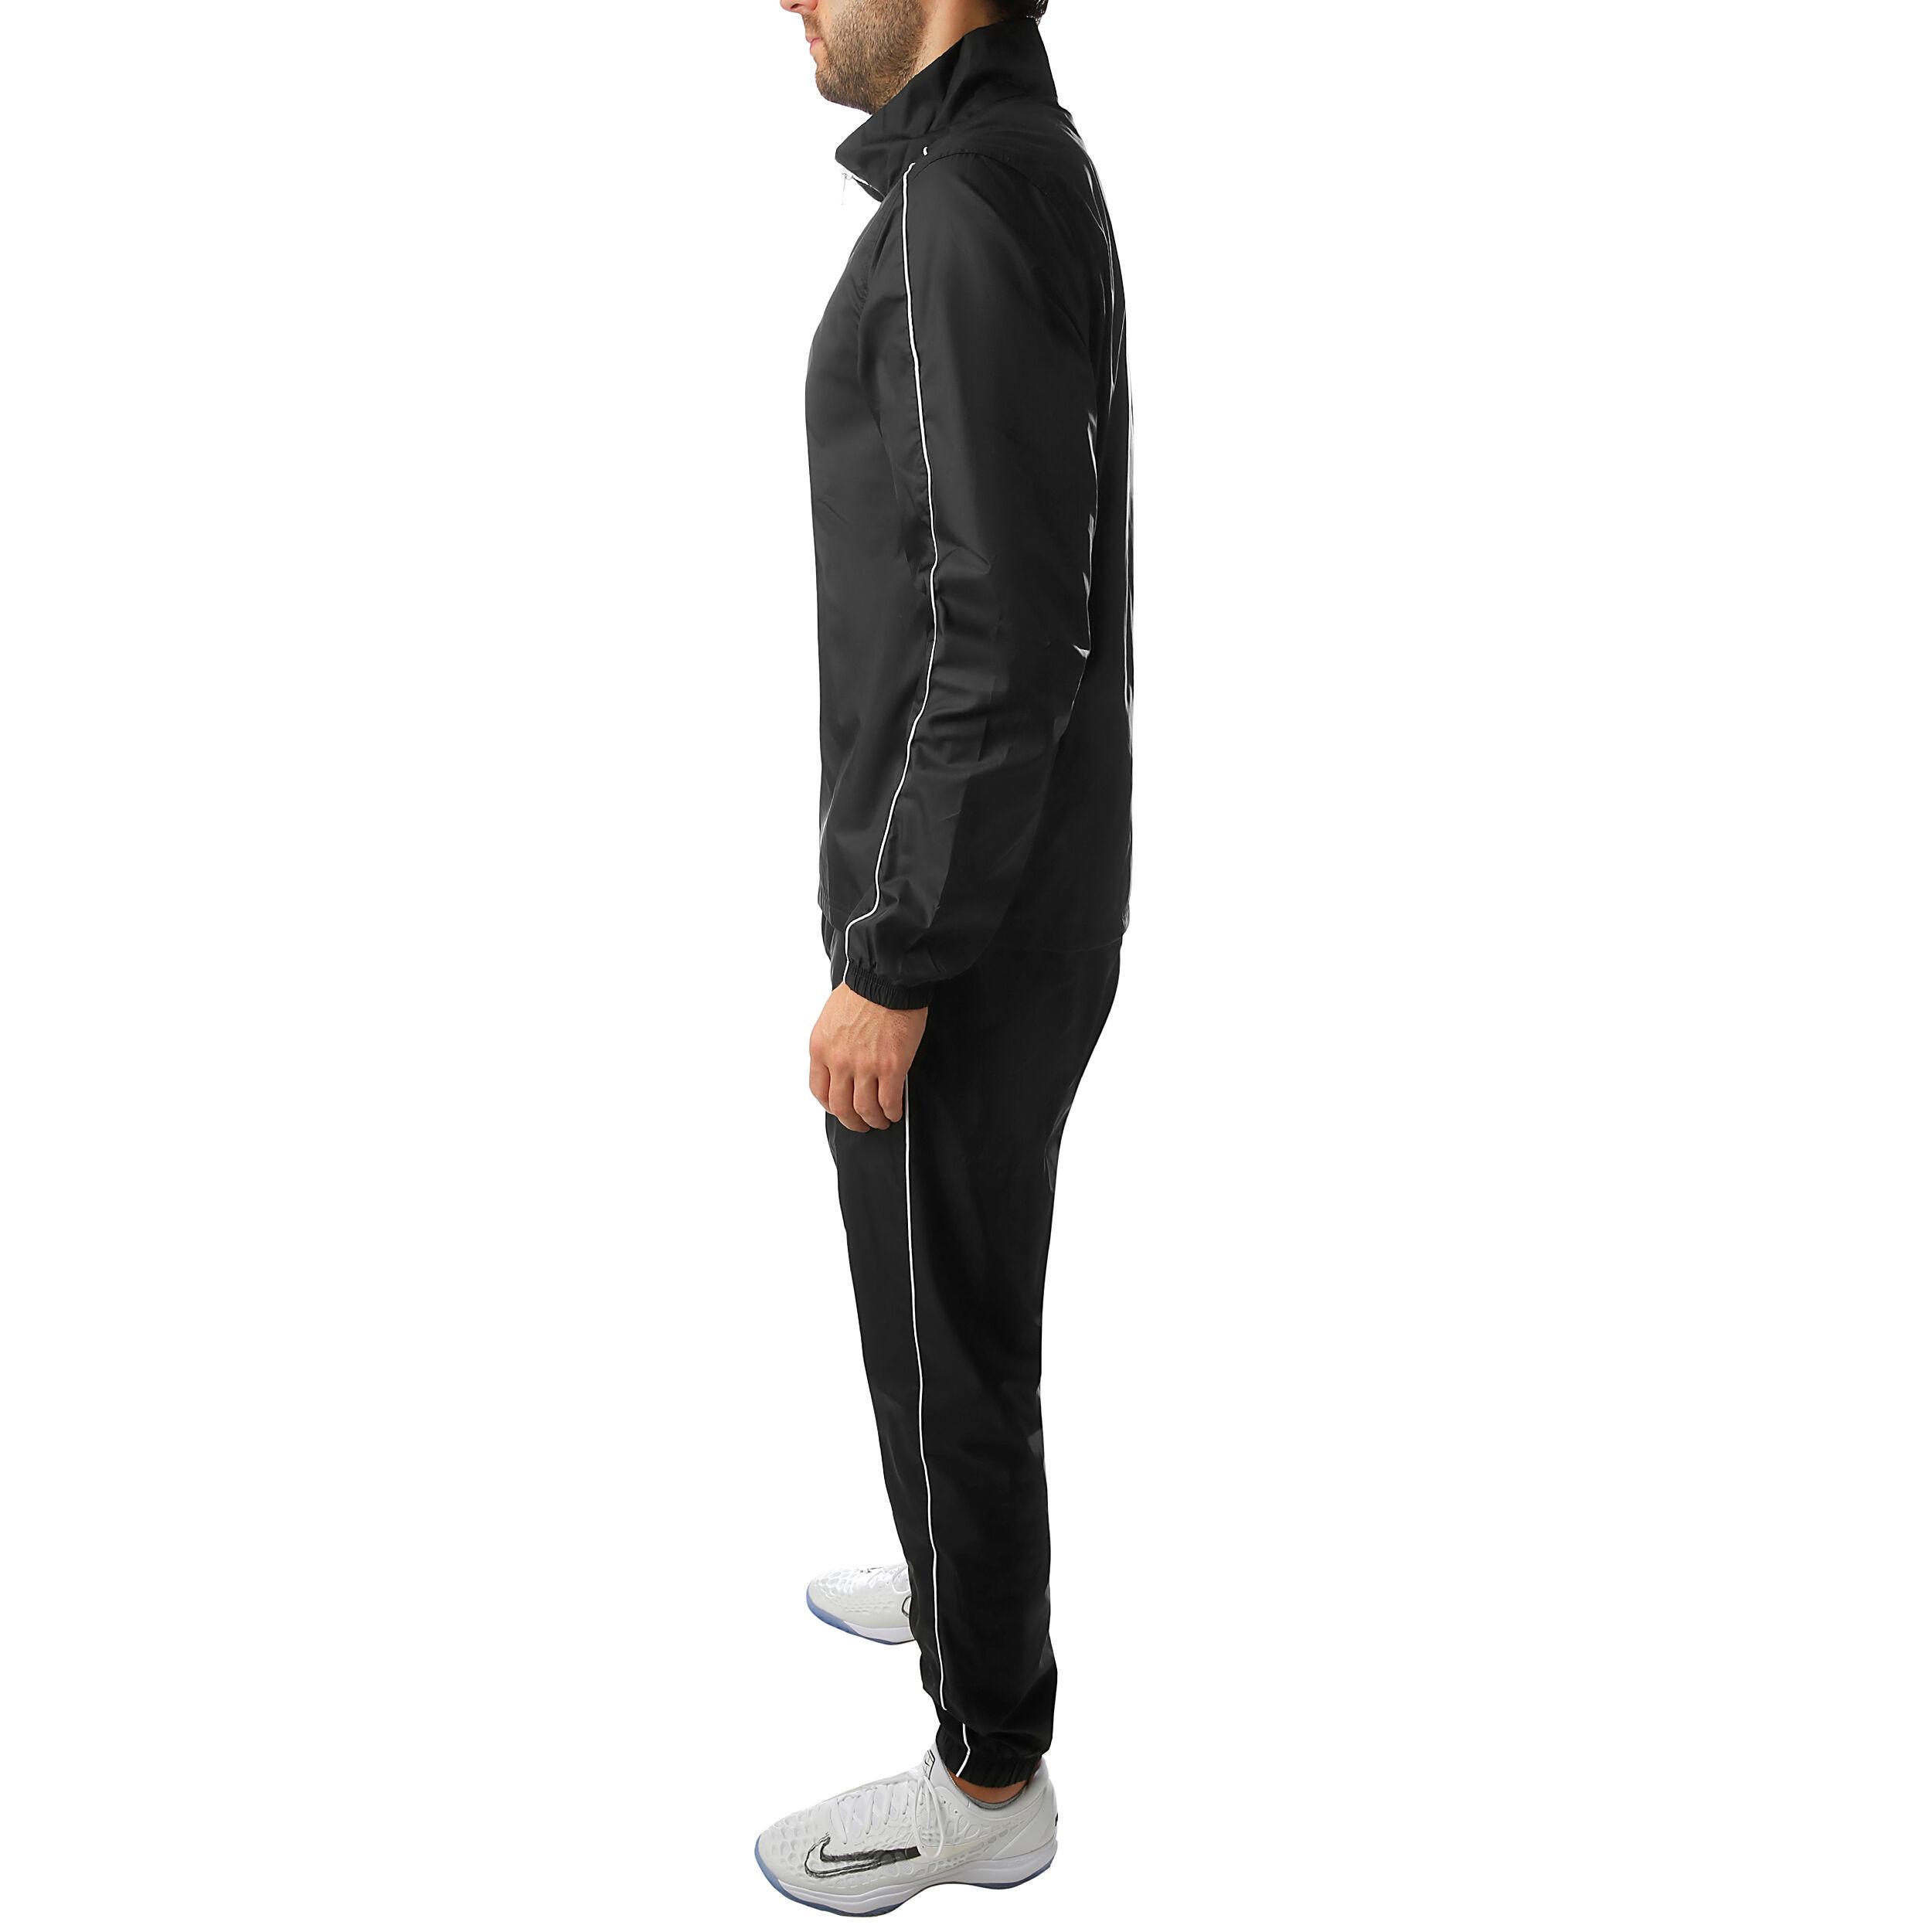 Hommes Survêtement Nike Woven NoirBlanc Sportswear zpGqjLMVSU